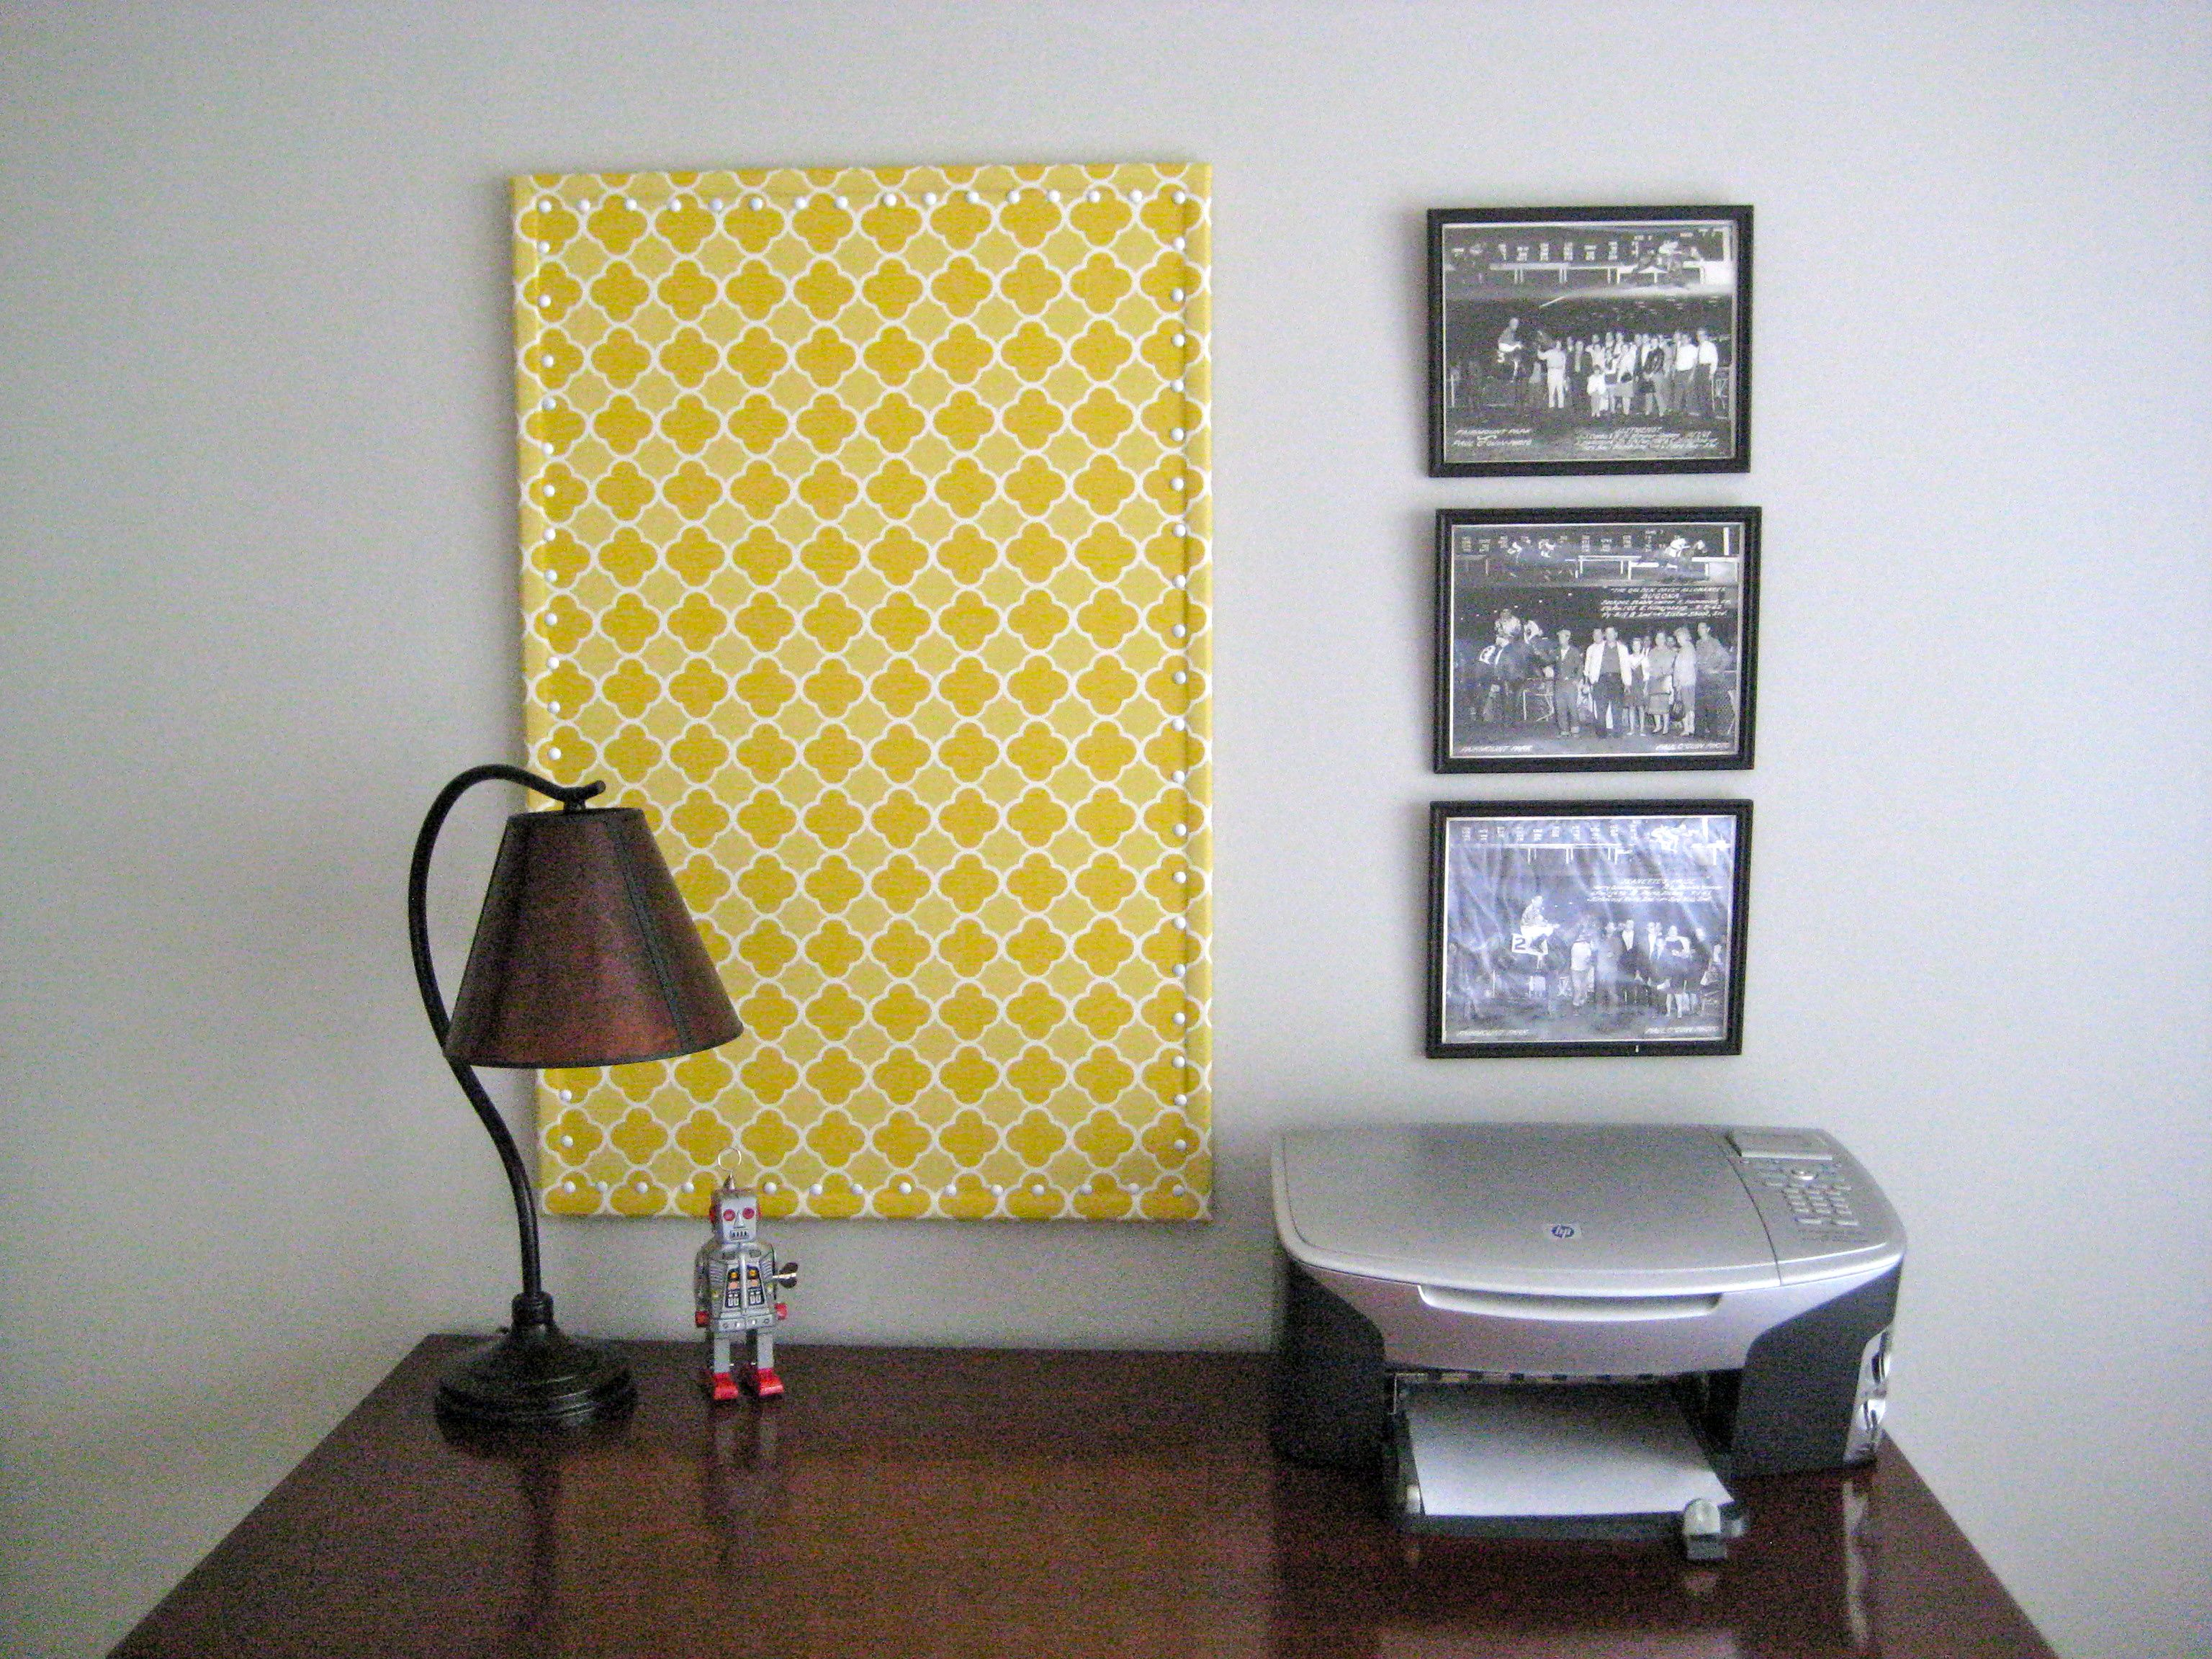 Exelent Fabric Decorations For Walls Crest - Art & Wall Decor ...